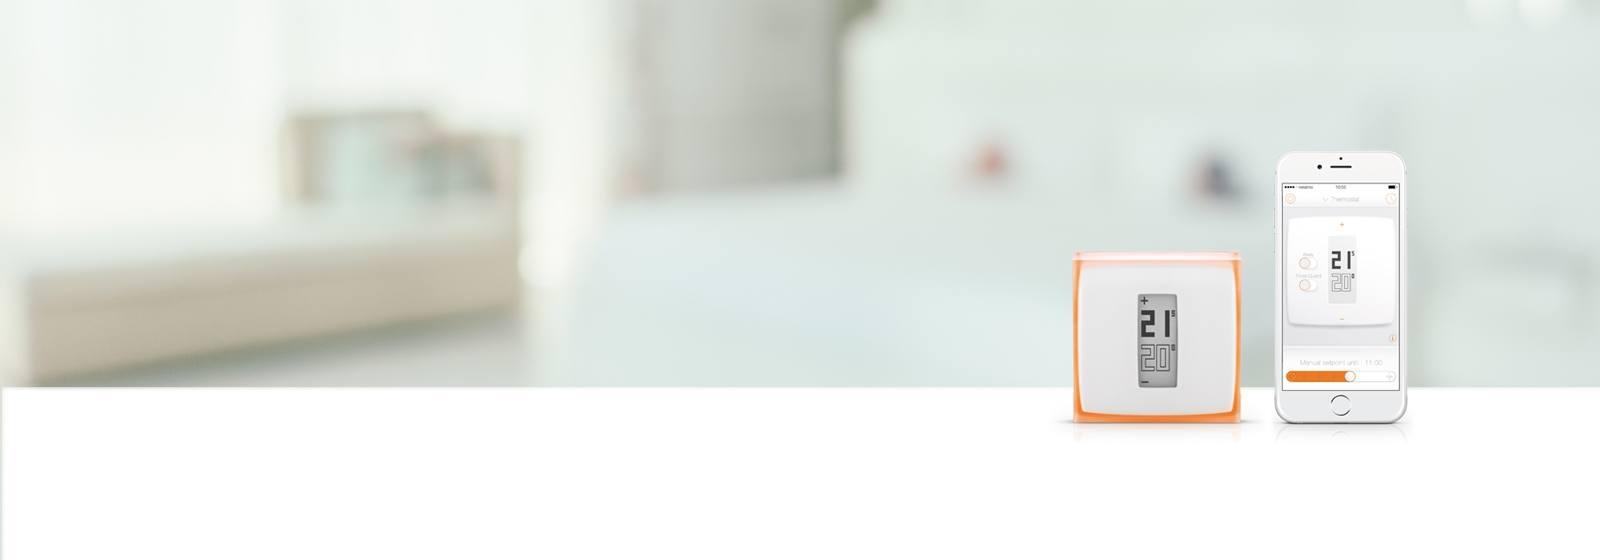 HeatSmart smart thermostat and mobile phone app